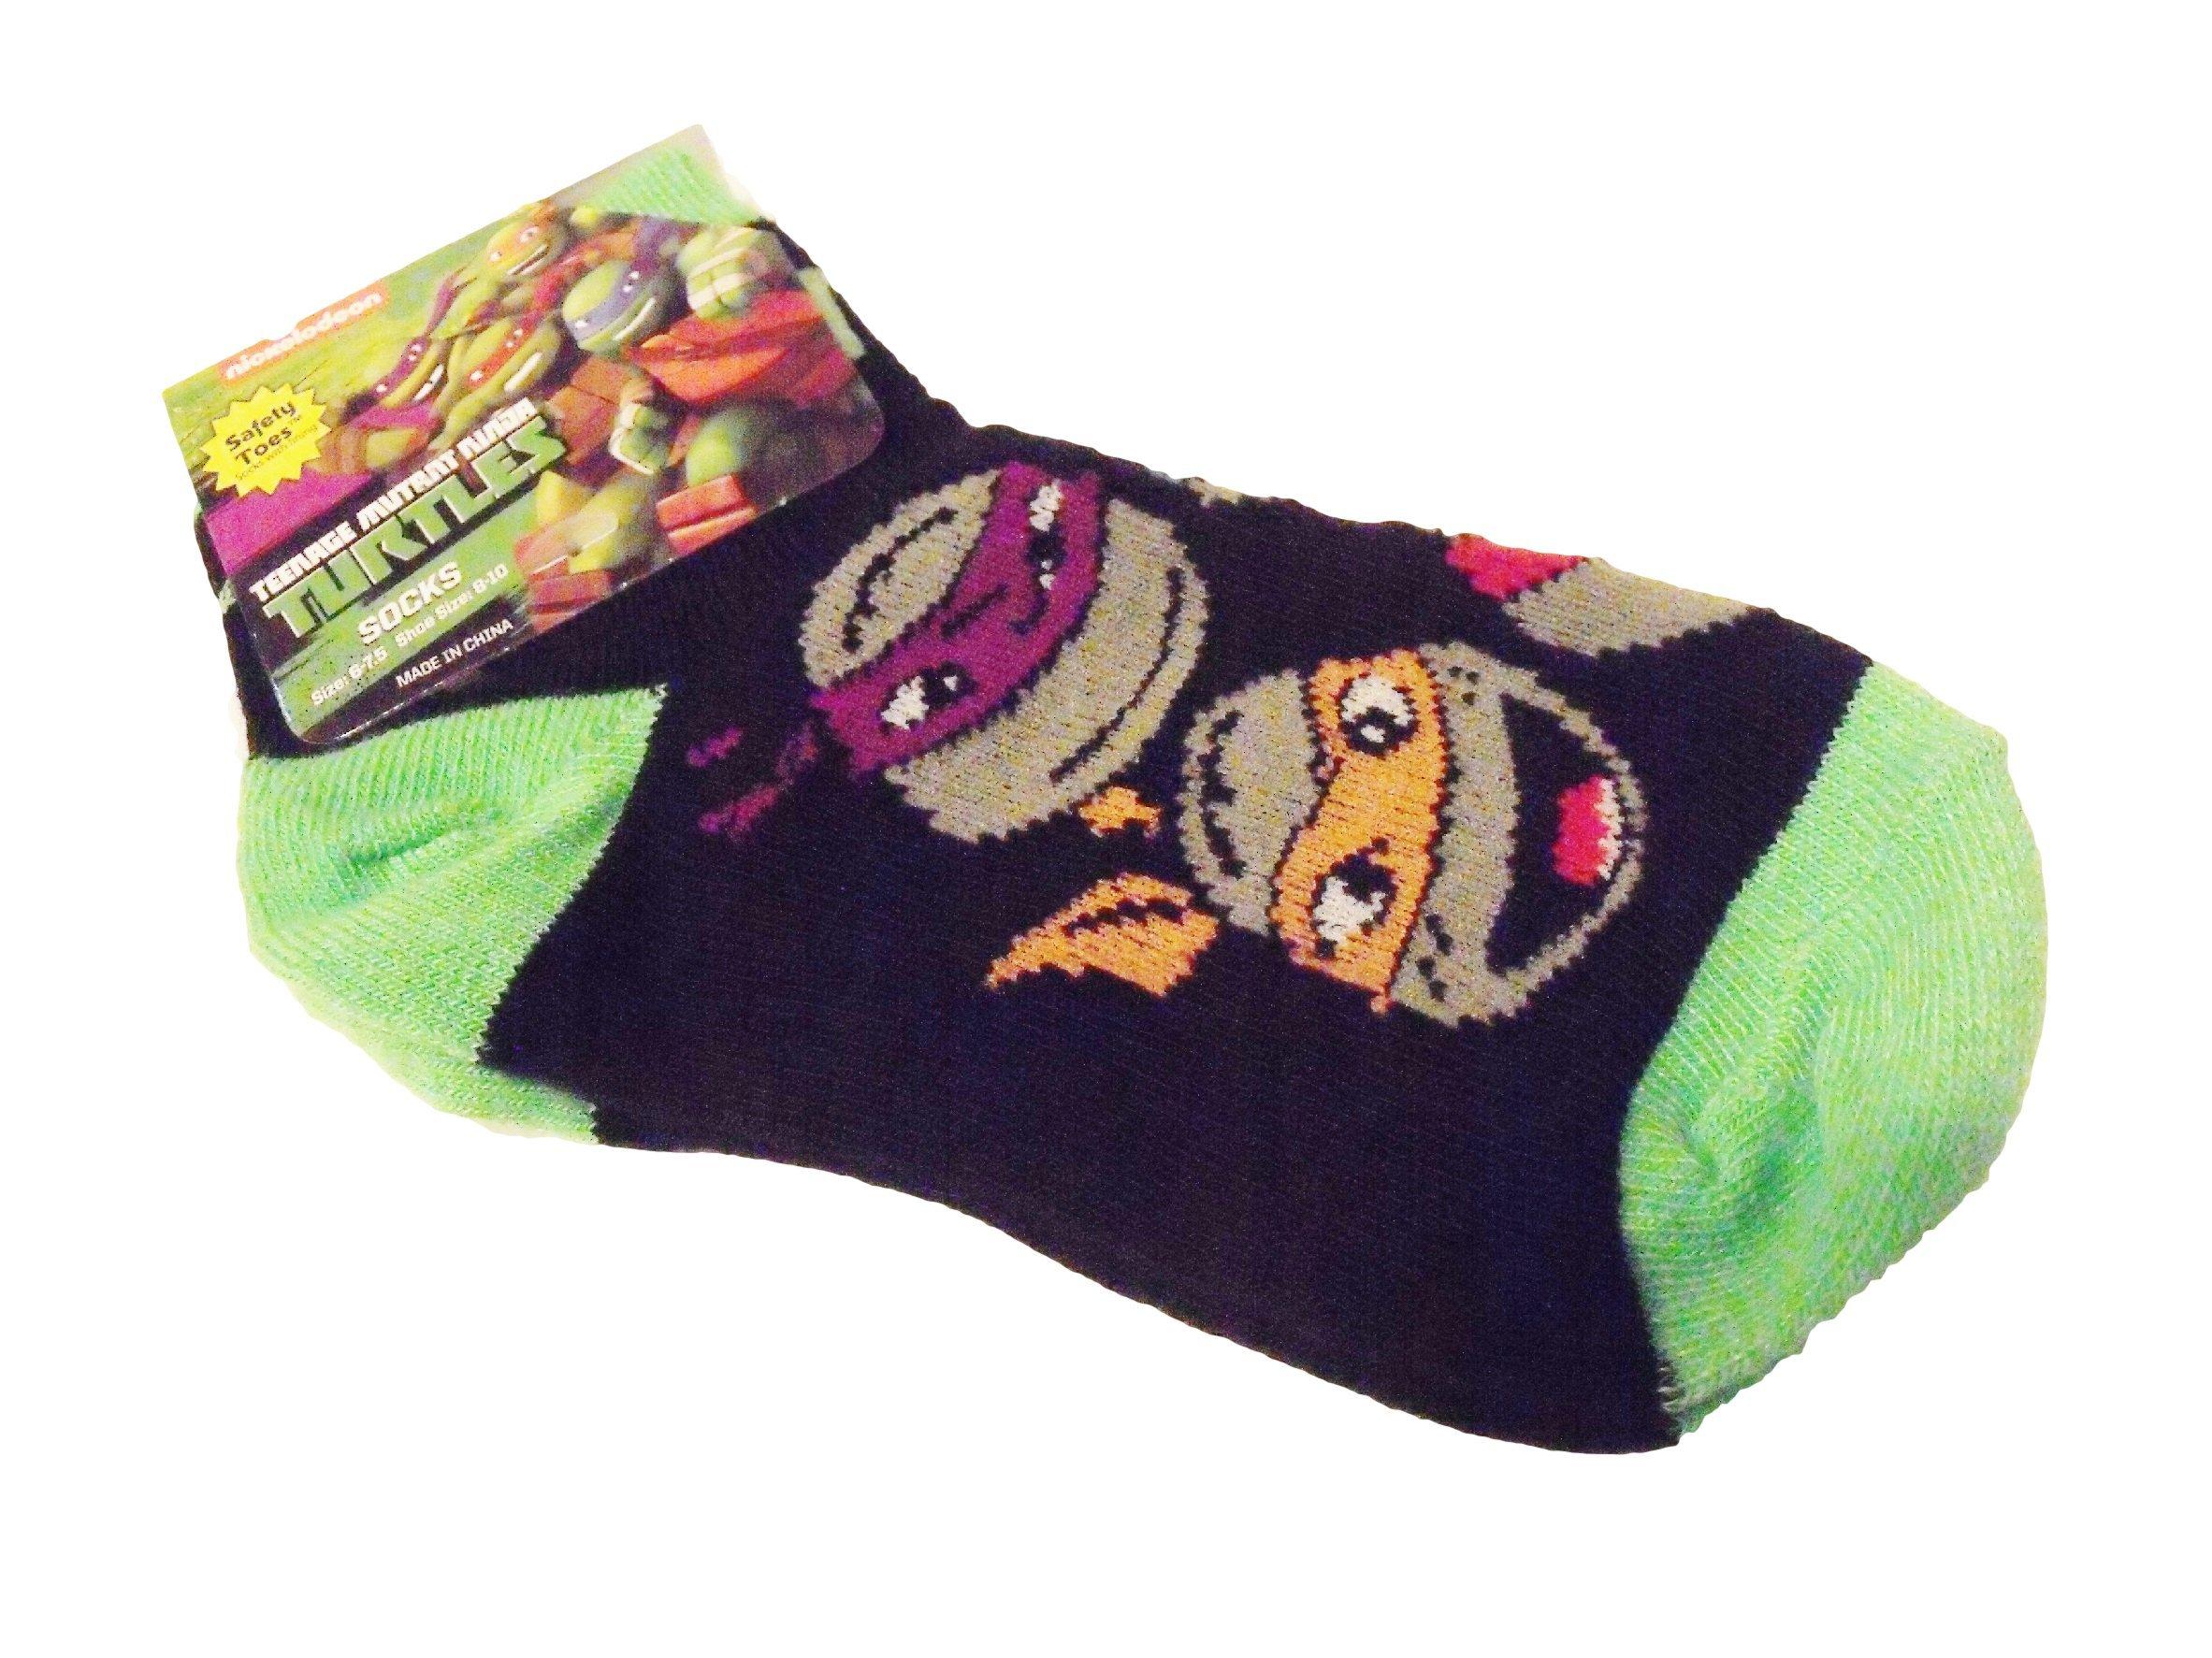 Teenage Mutant Ninja Turtles Faces Shoe Size 1-5 Green Black Toddler Boy Socks